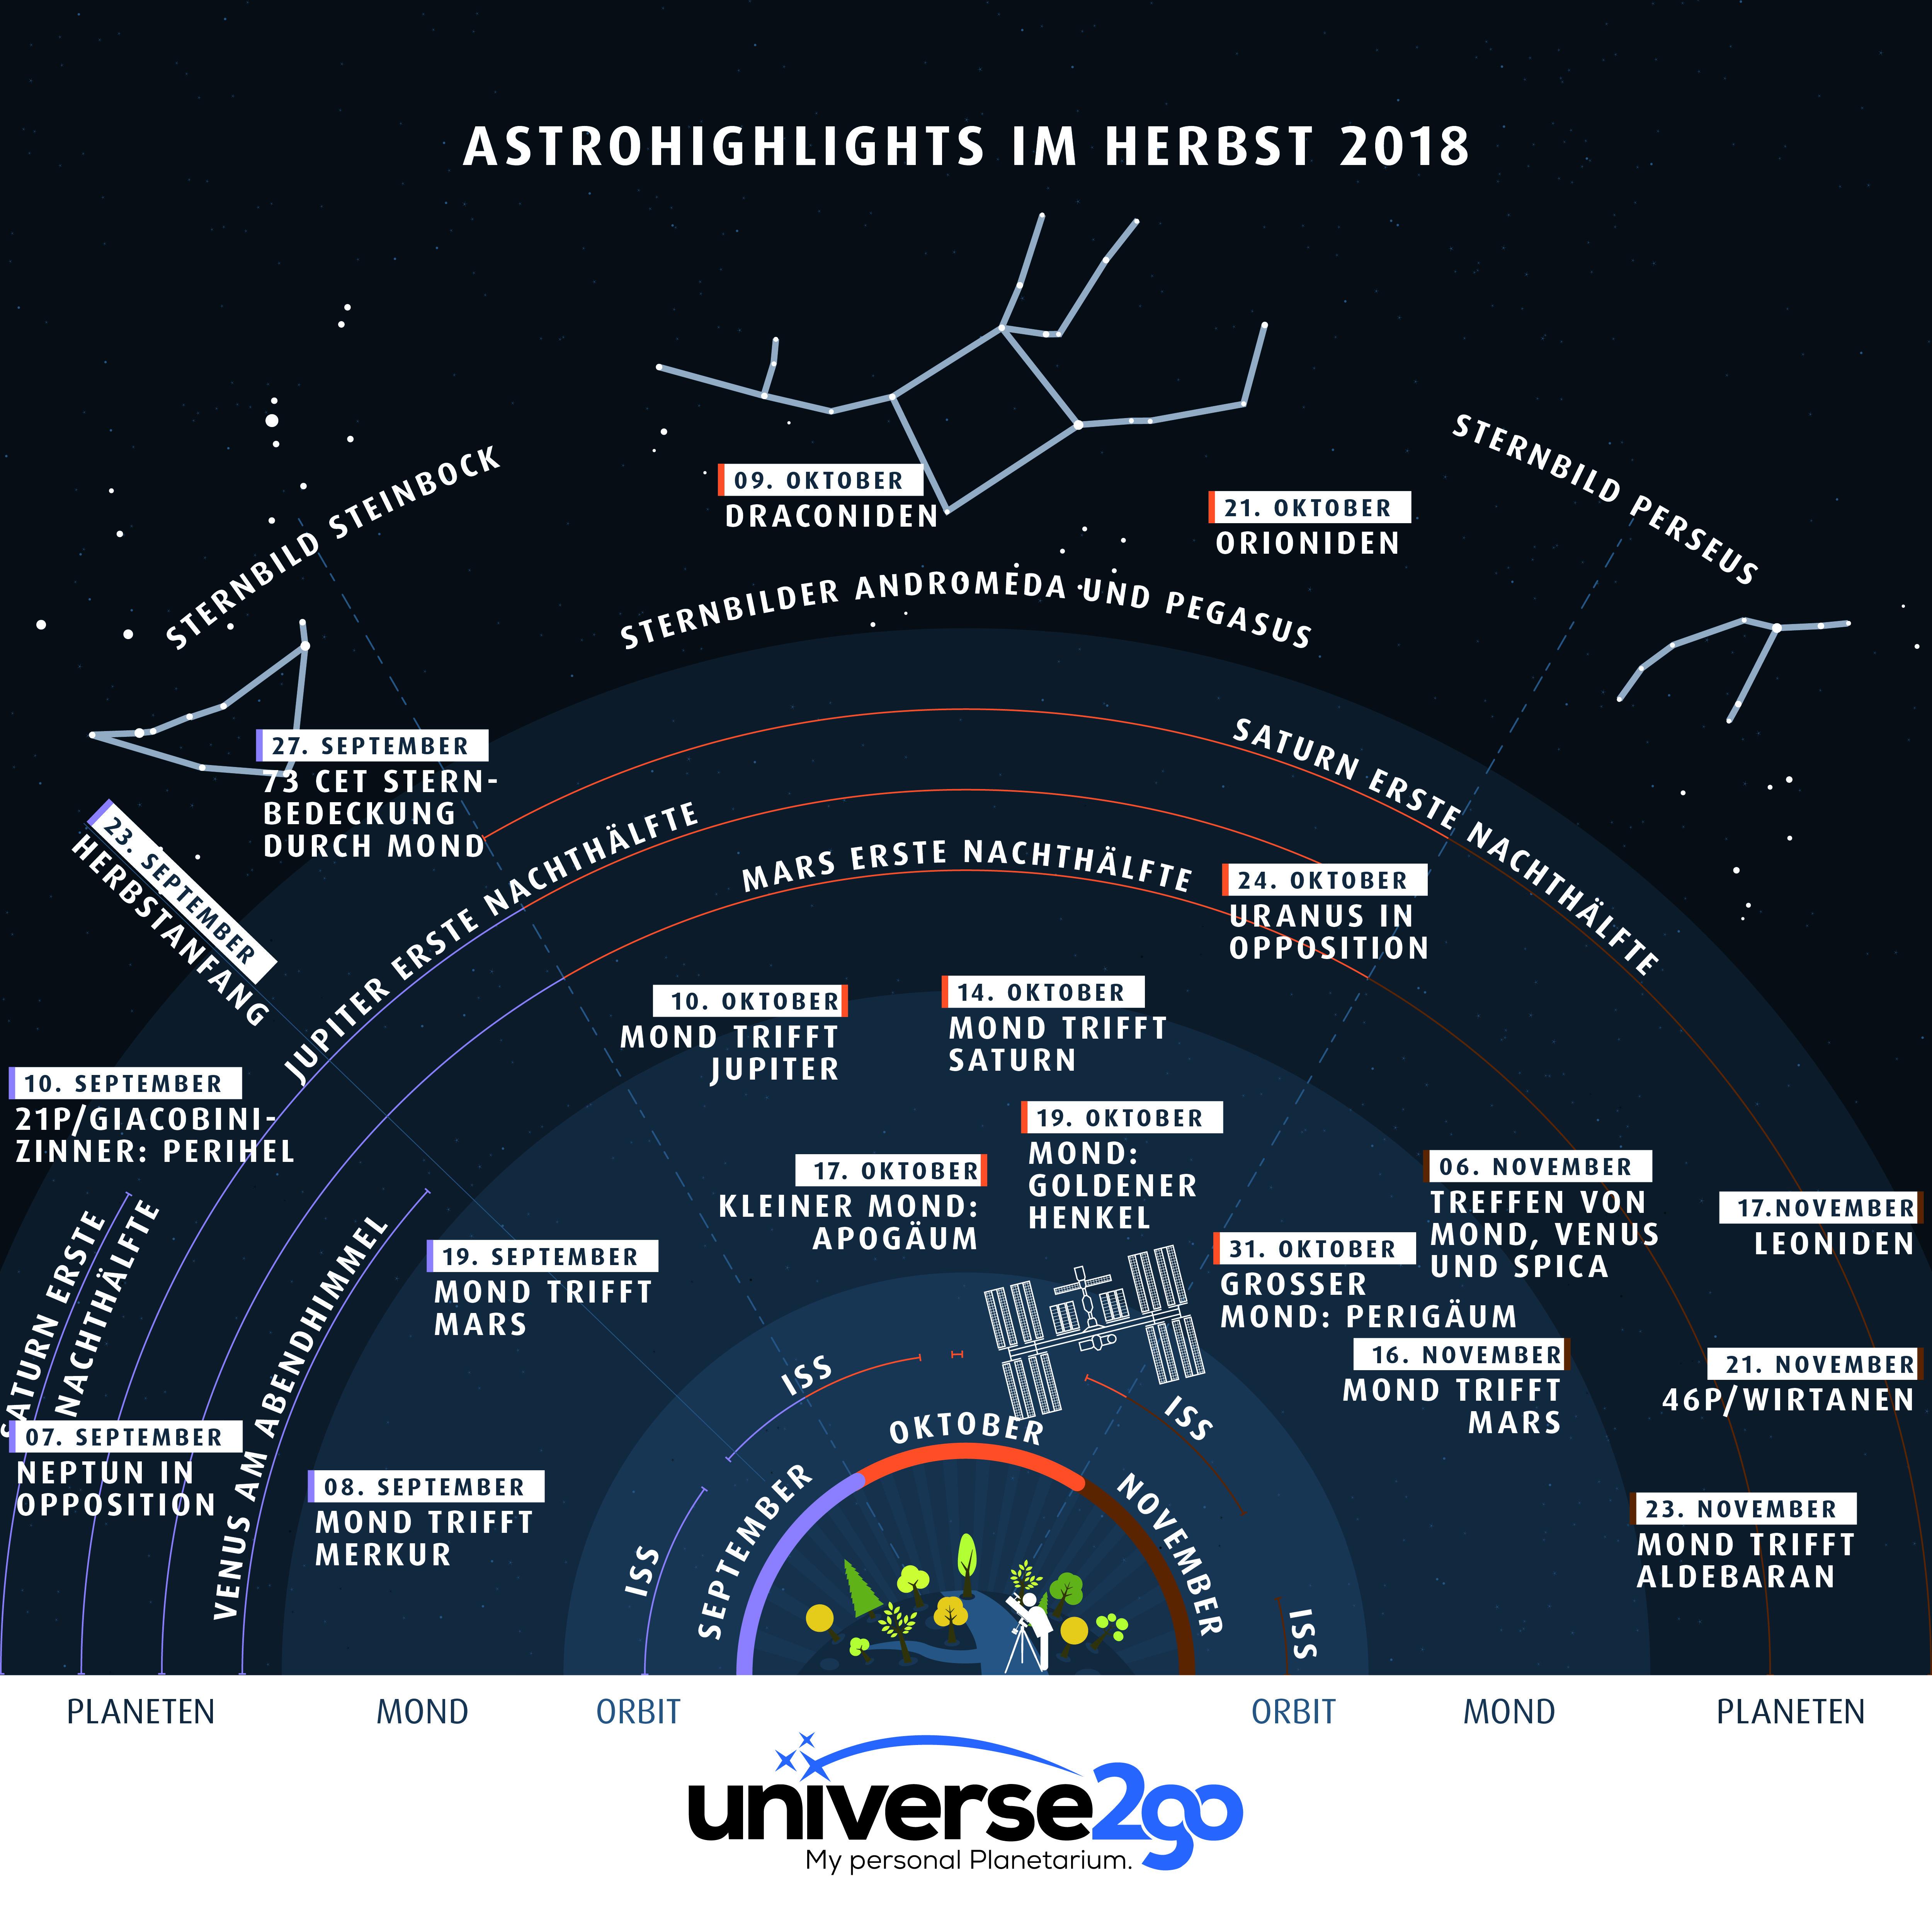 Infografik–astrohighlights-im-herbst-2018-alles-was-man-september-bis-november-sehen-kann